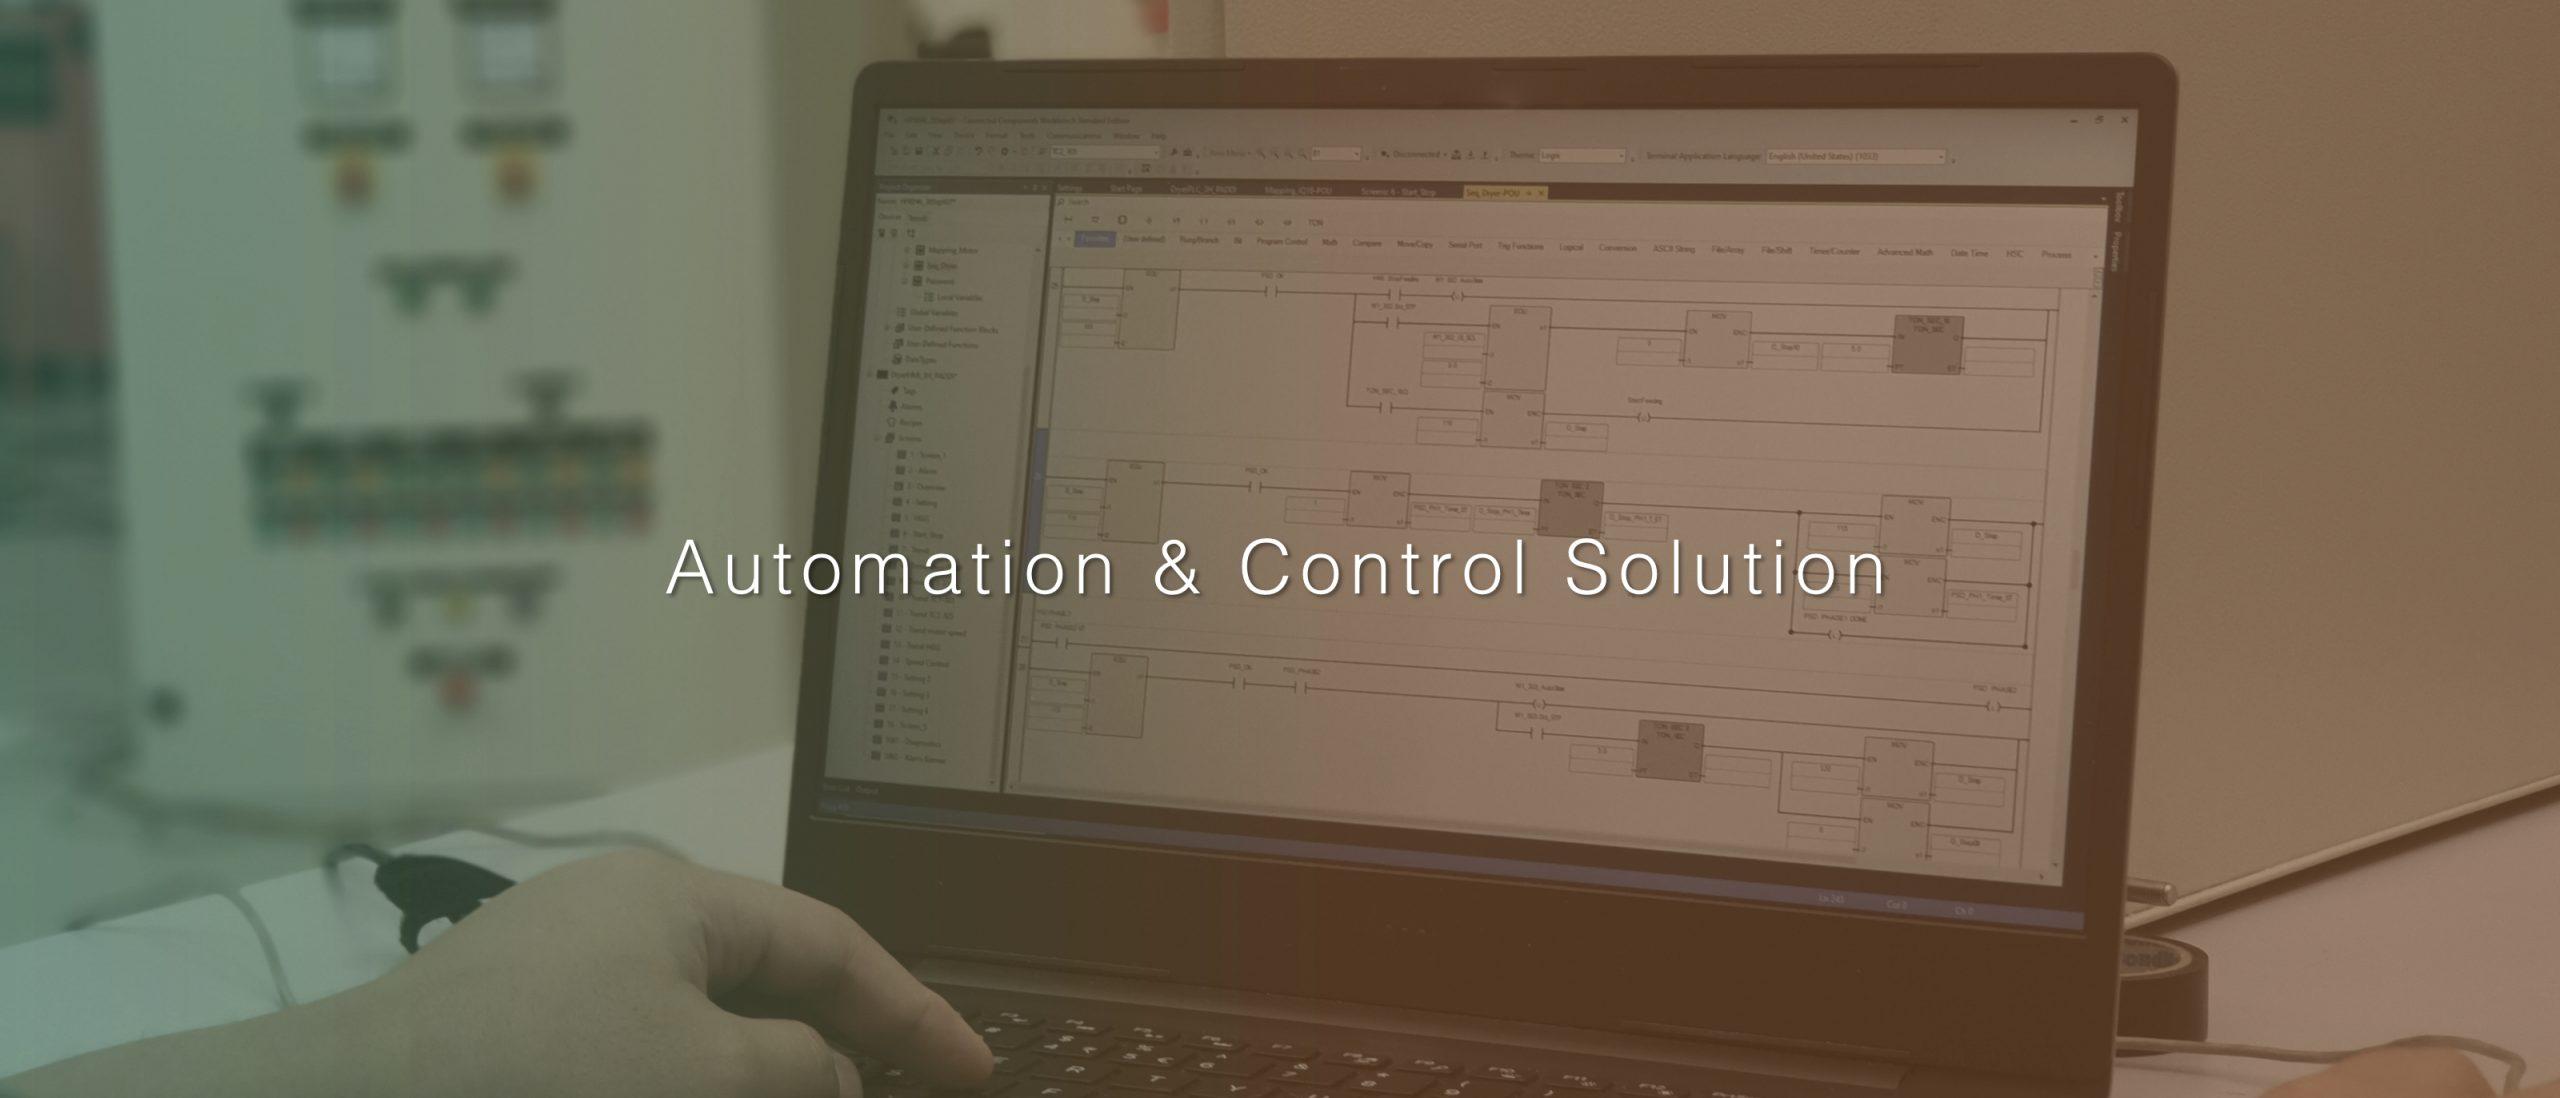 PADDI Automation & Control Solution